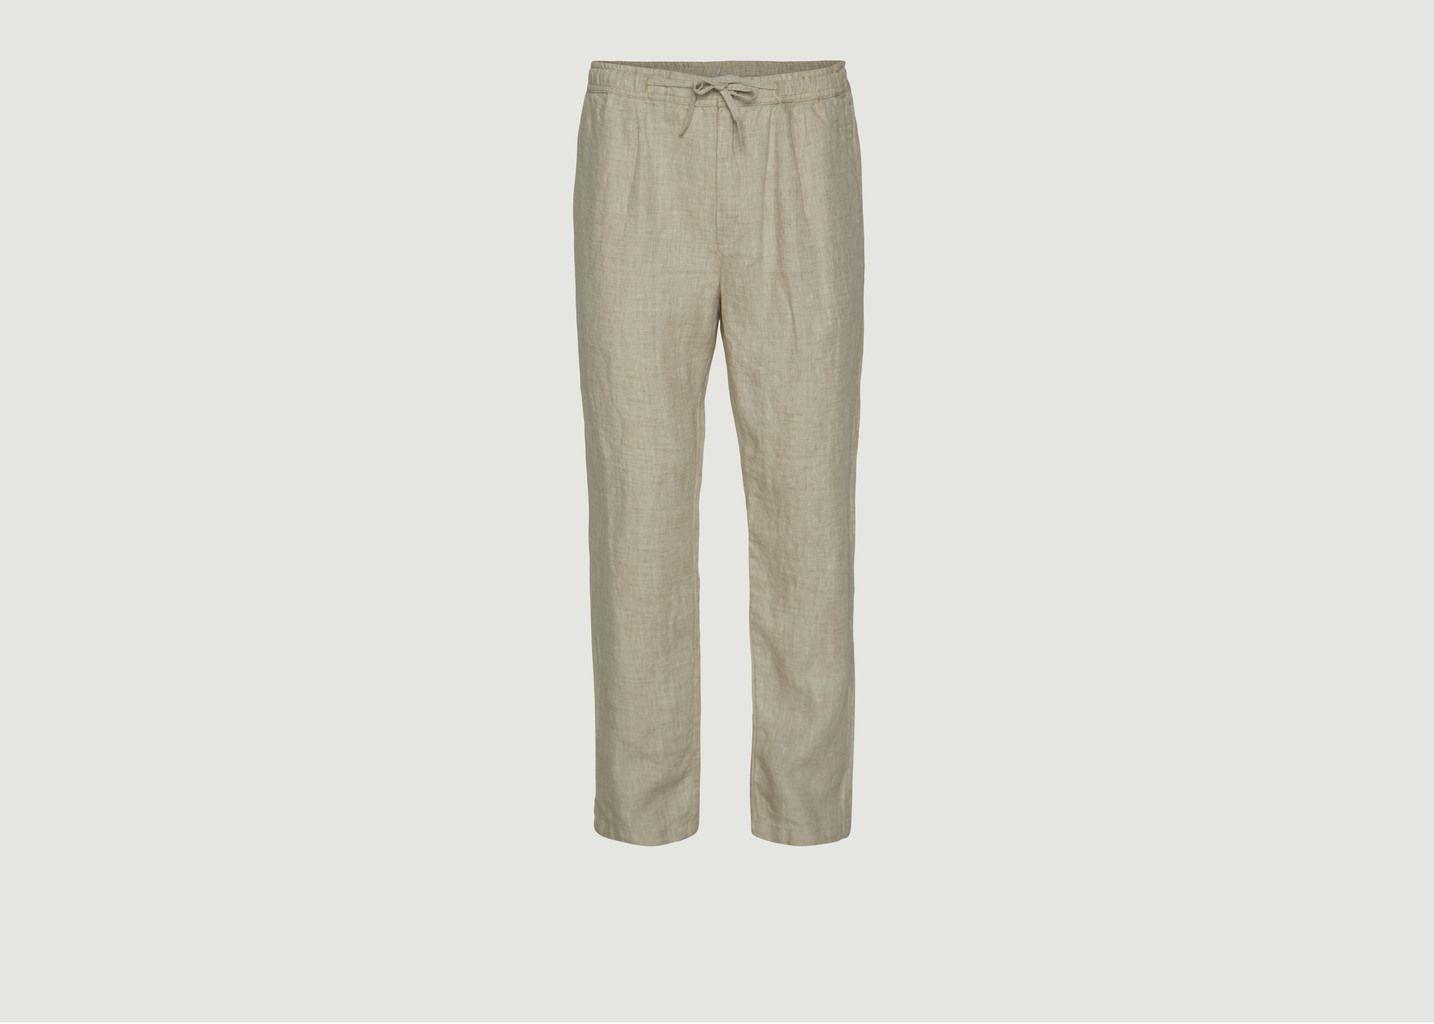 Pantalon Birch Lin Taille Élastiquée - KCA